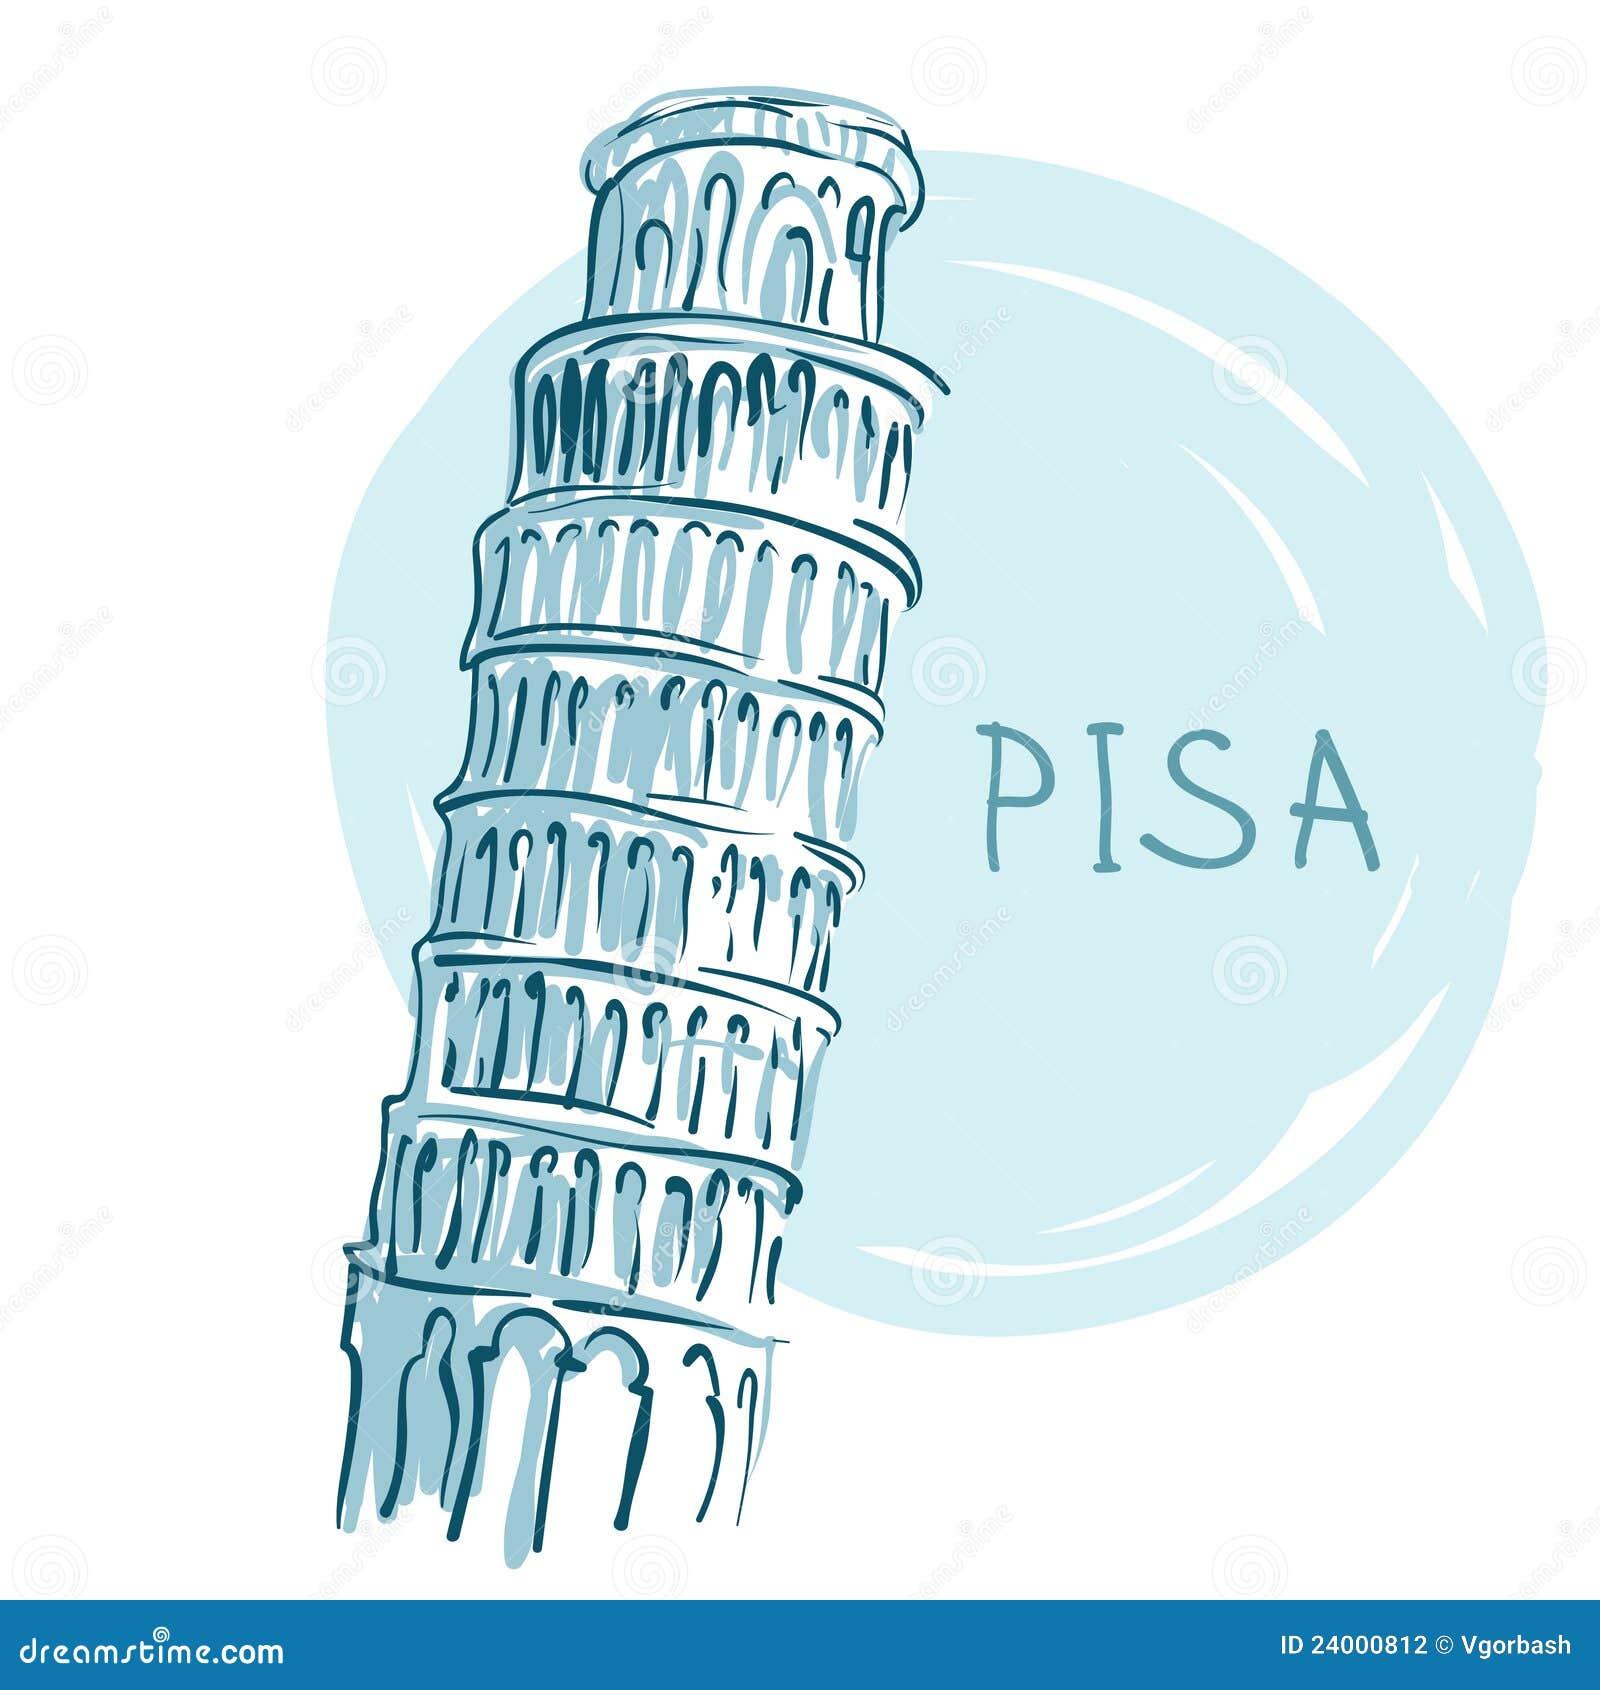 World famous landmark series: The Leaning Tower, Pisa, Italy, Europe.